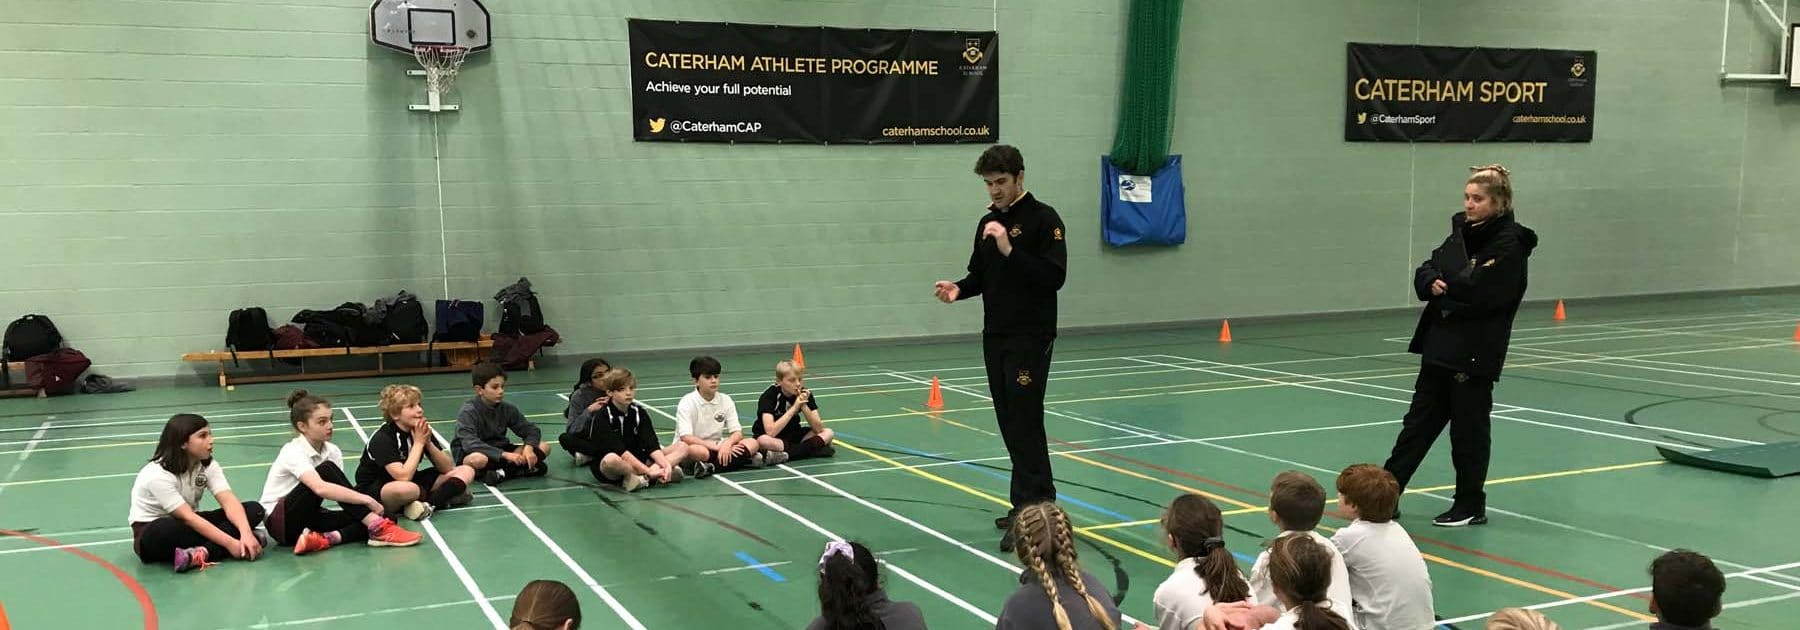 Caterham Athlete Programme Arrives at Prep